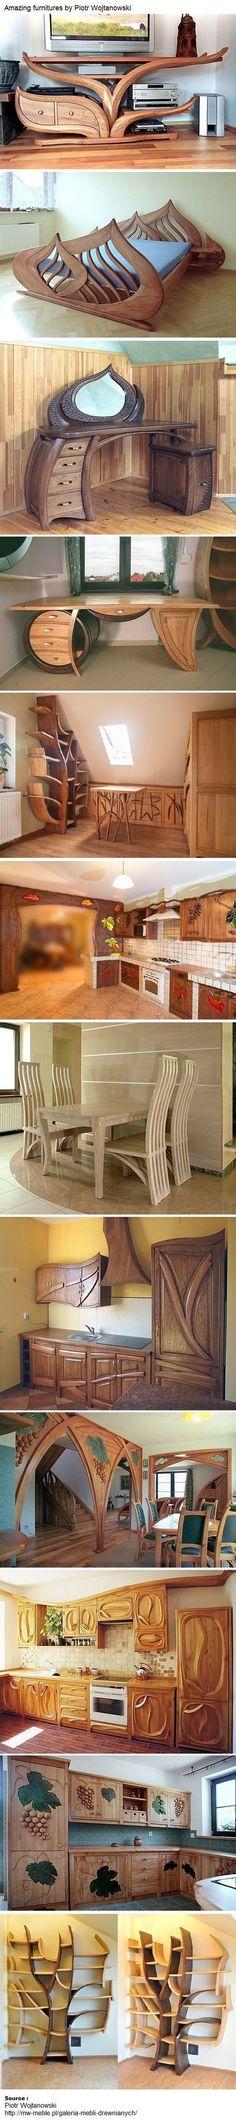 Amazing furnitures by Piotr Wojtanowski: